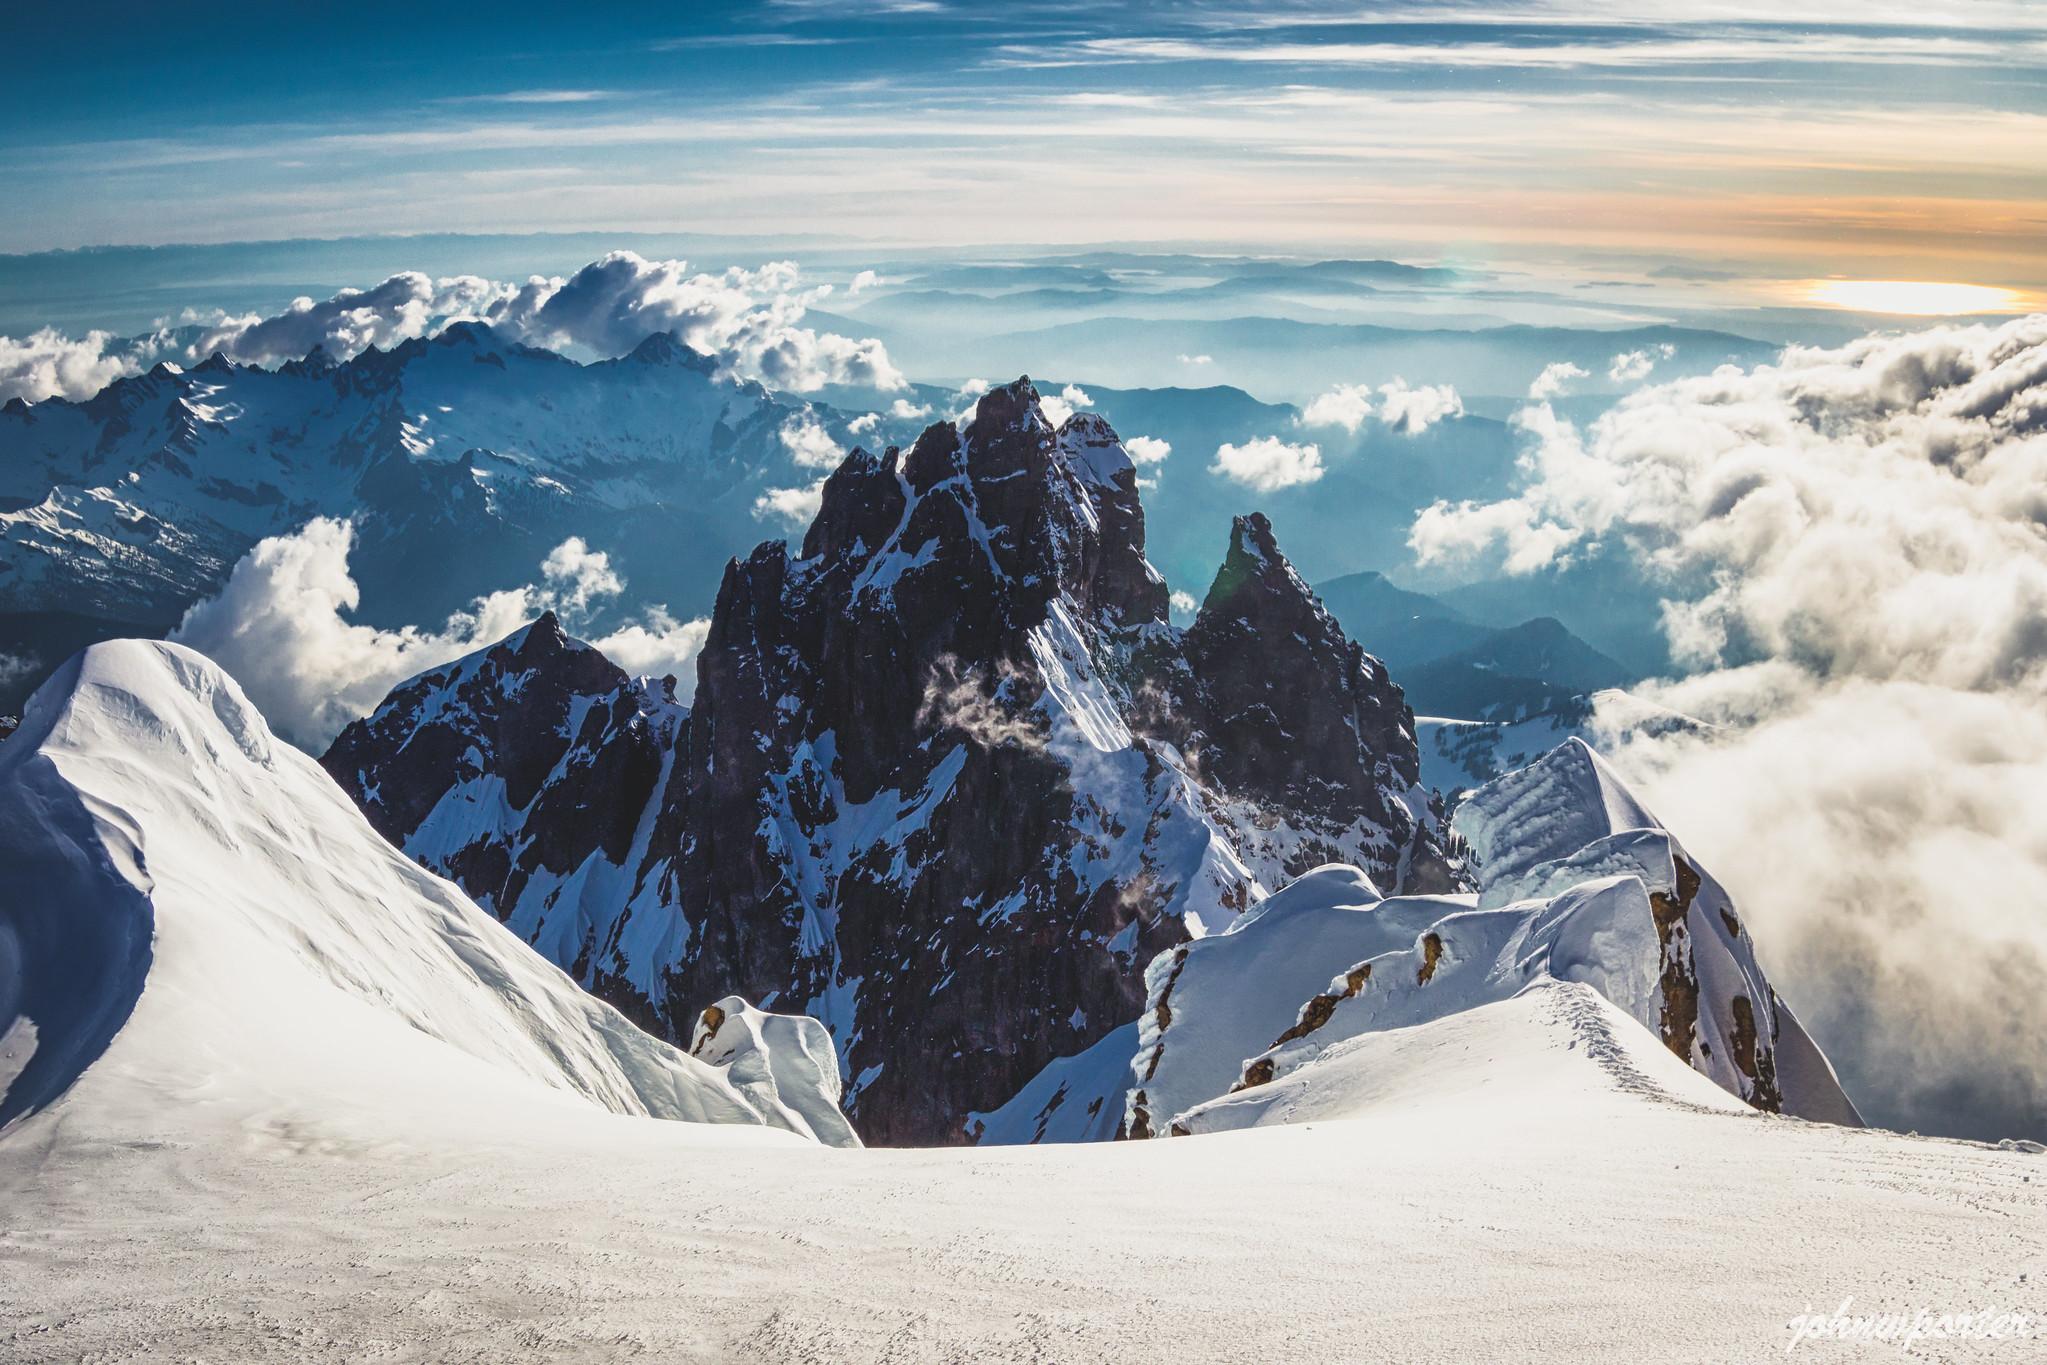 Lincoln Peak from Colfax Peak